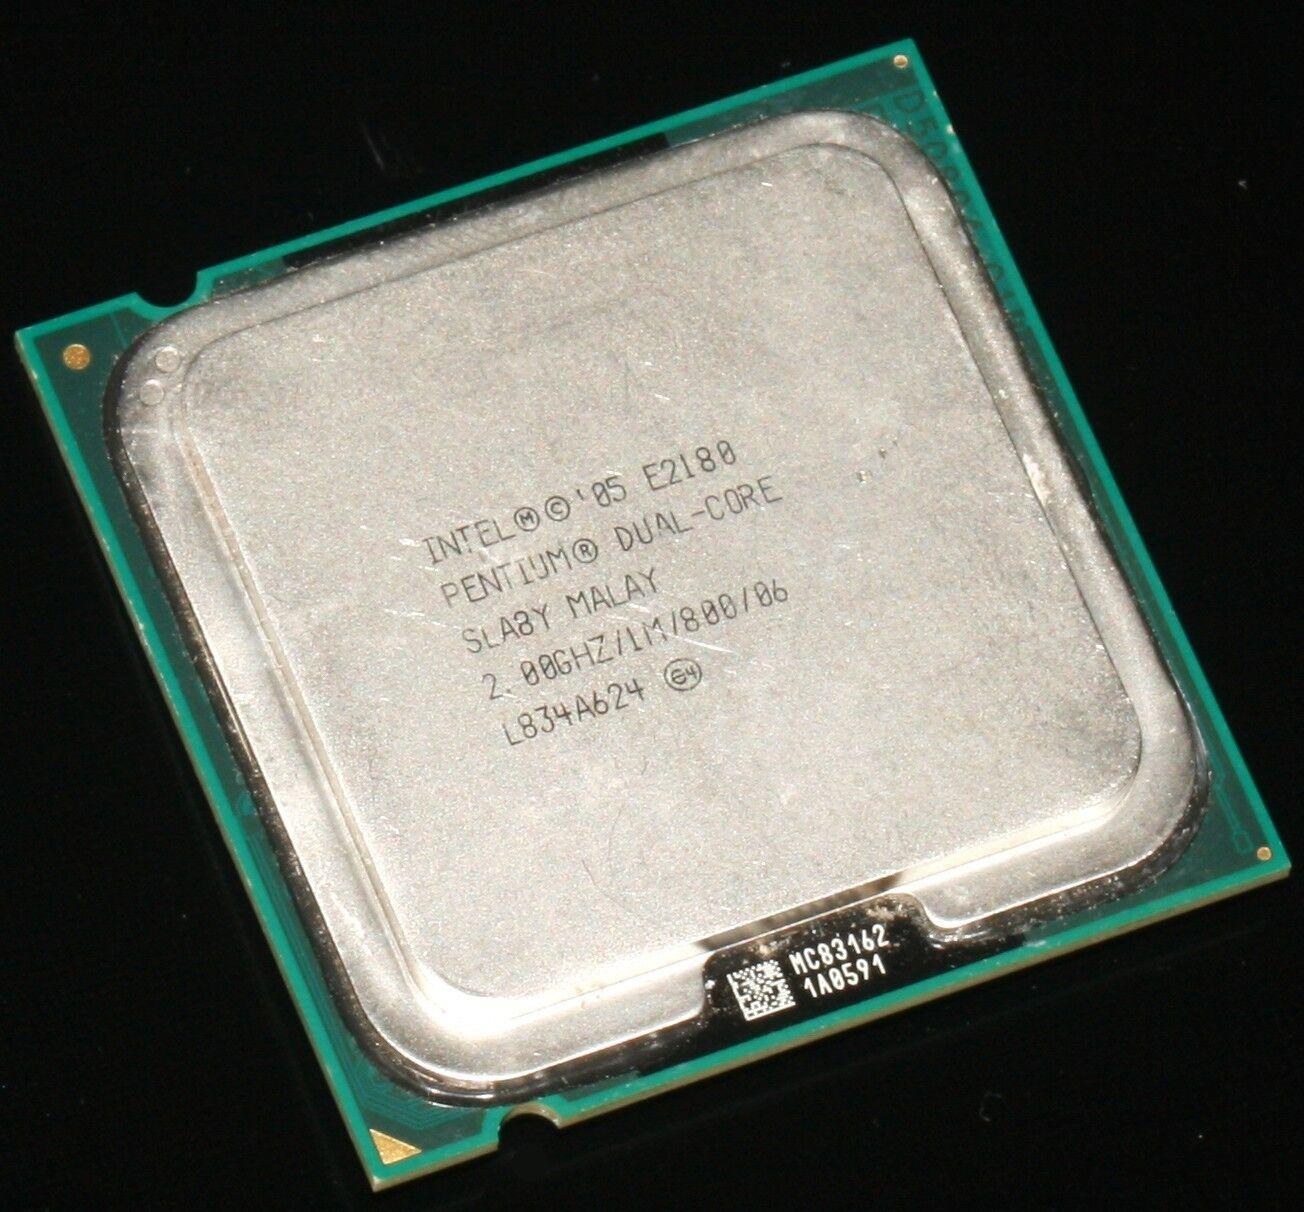 Intel Pentium Dual Core E2180 Dual Core, 2,00GHz/1M/800